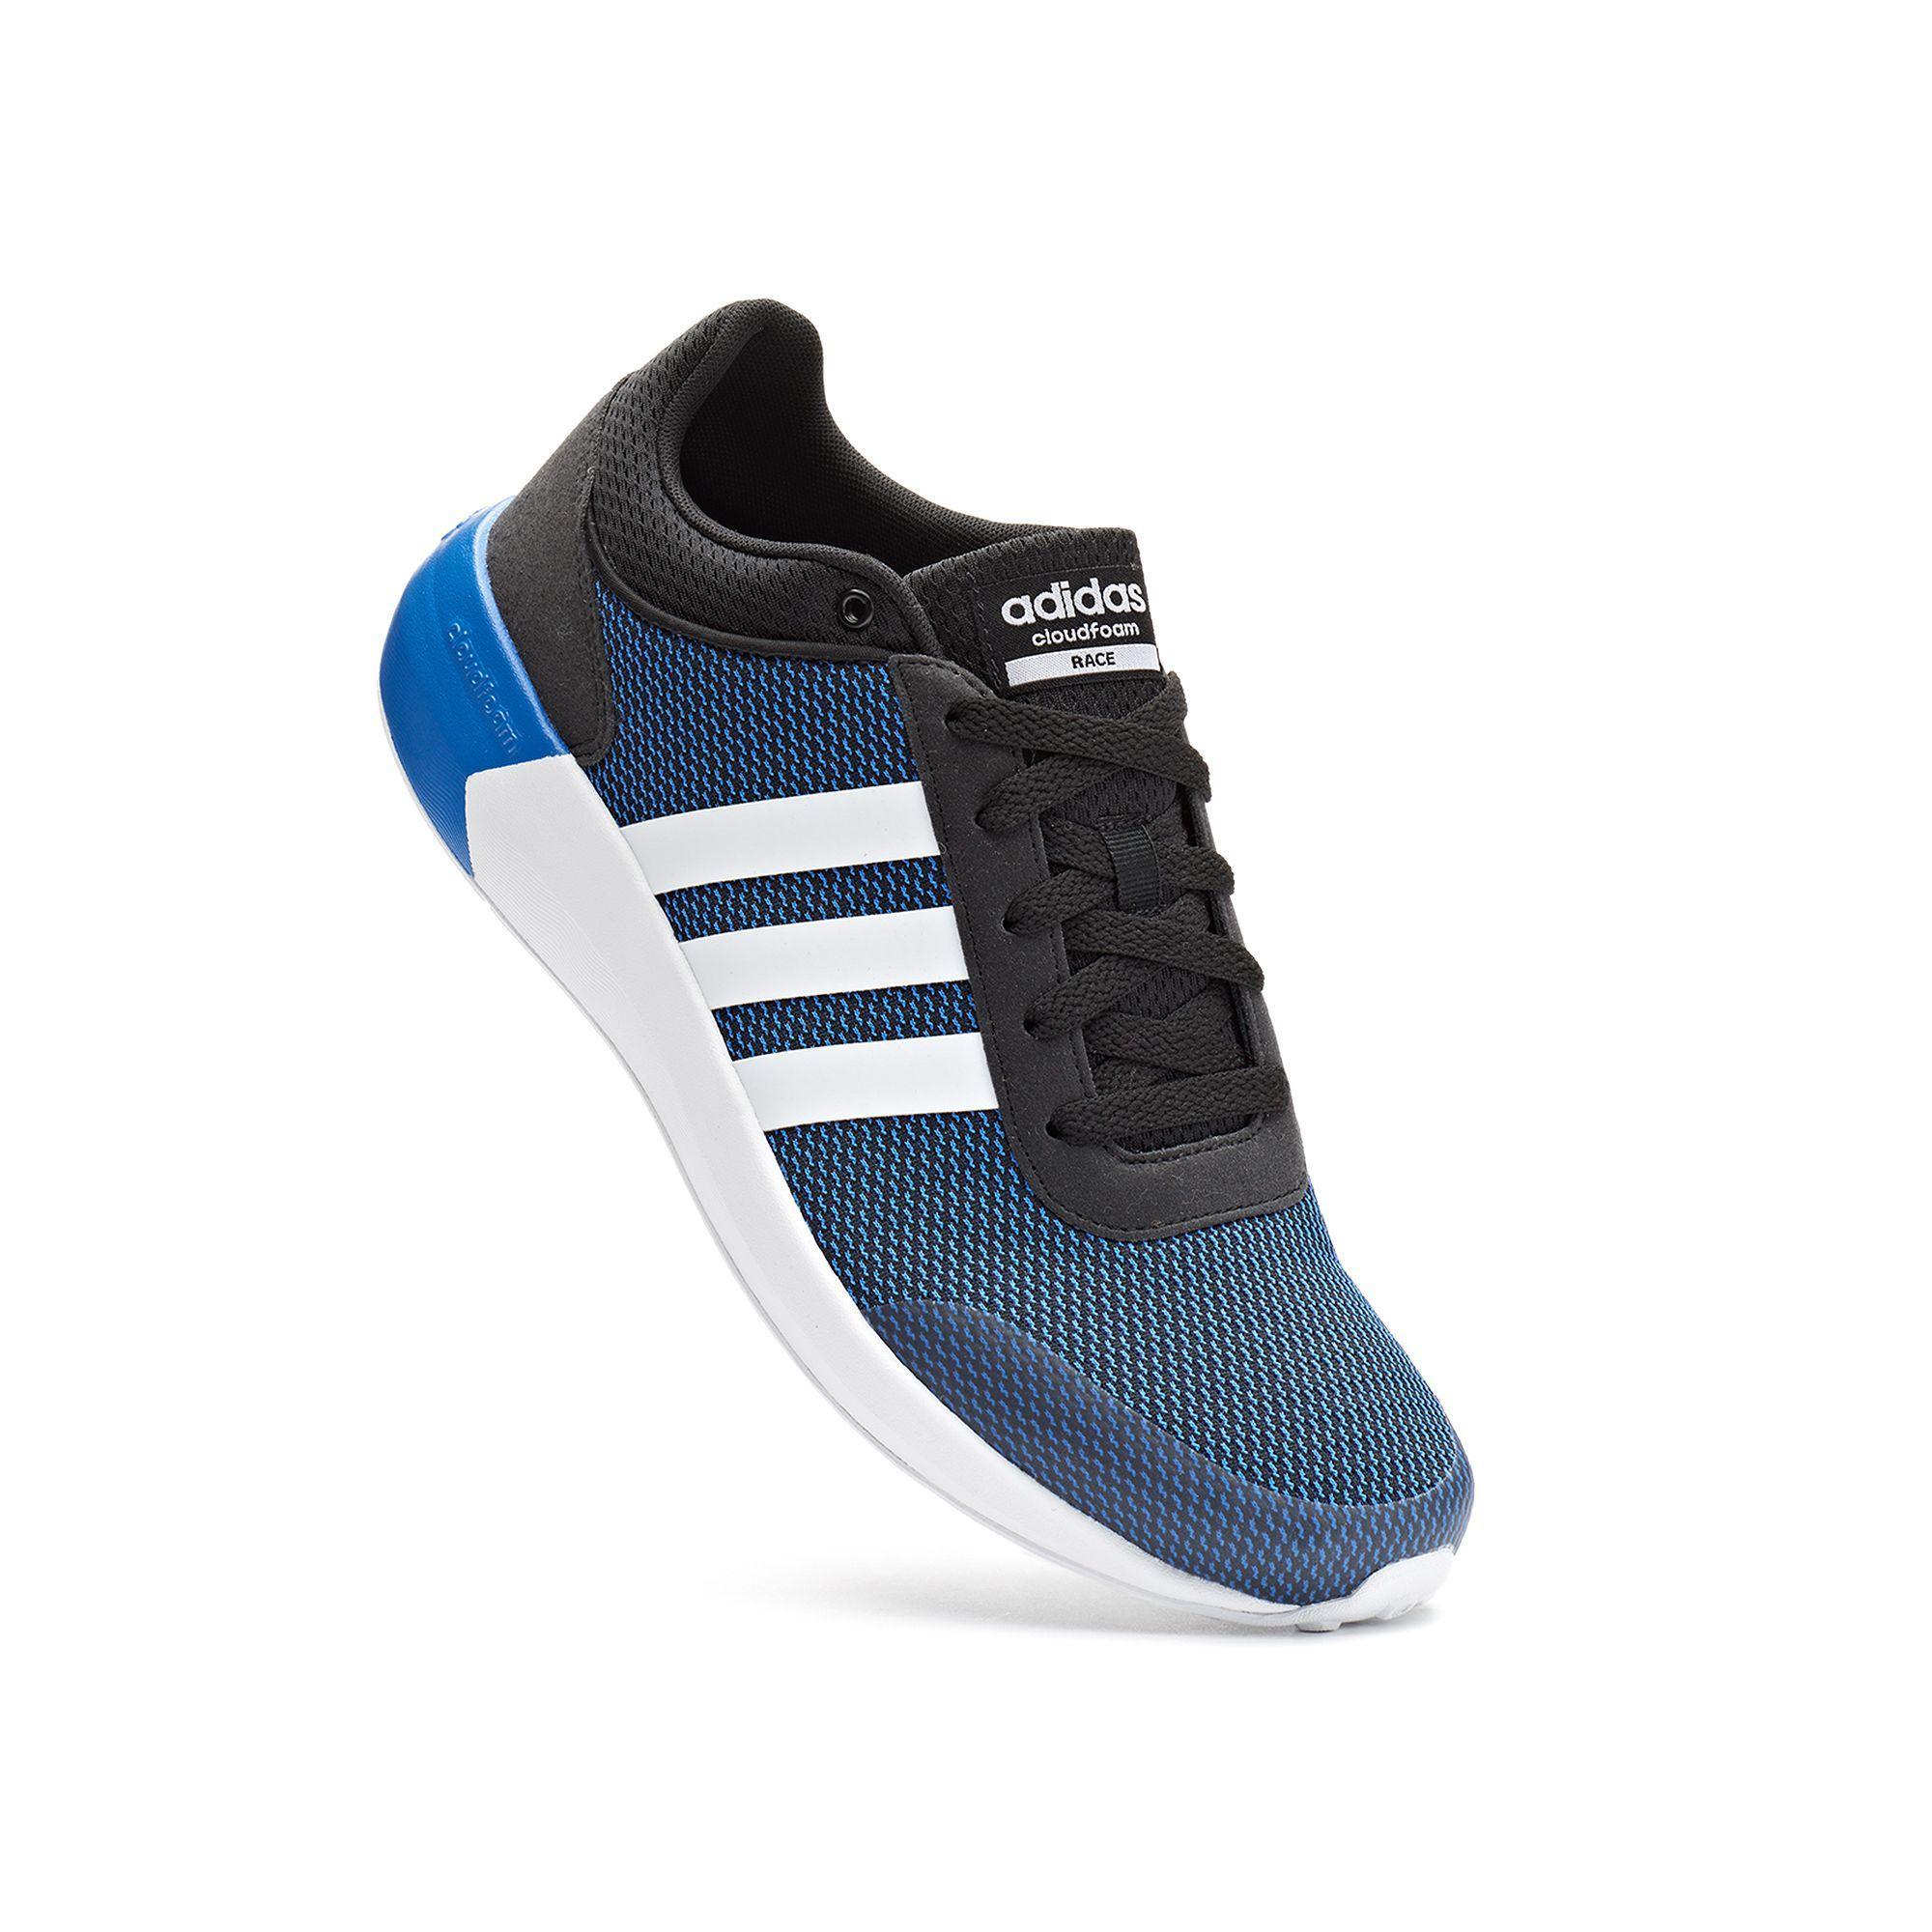 adidas NEO Cloudfoam Race Men's Athletic Shoes   Mens athletic ...